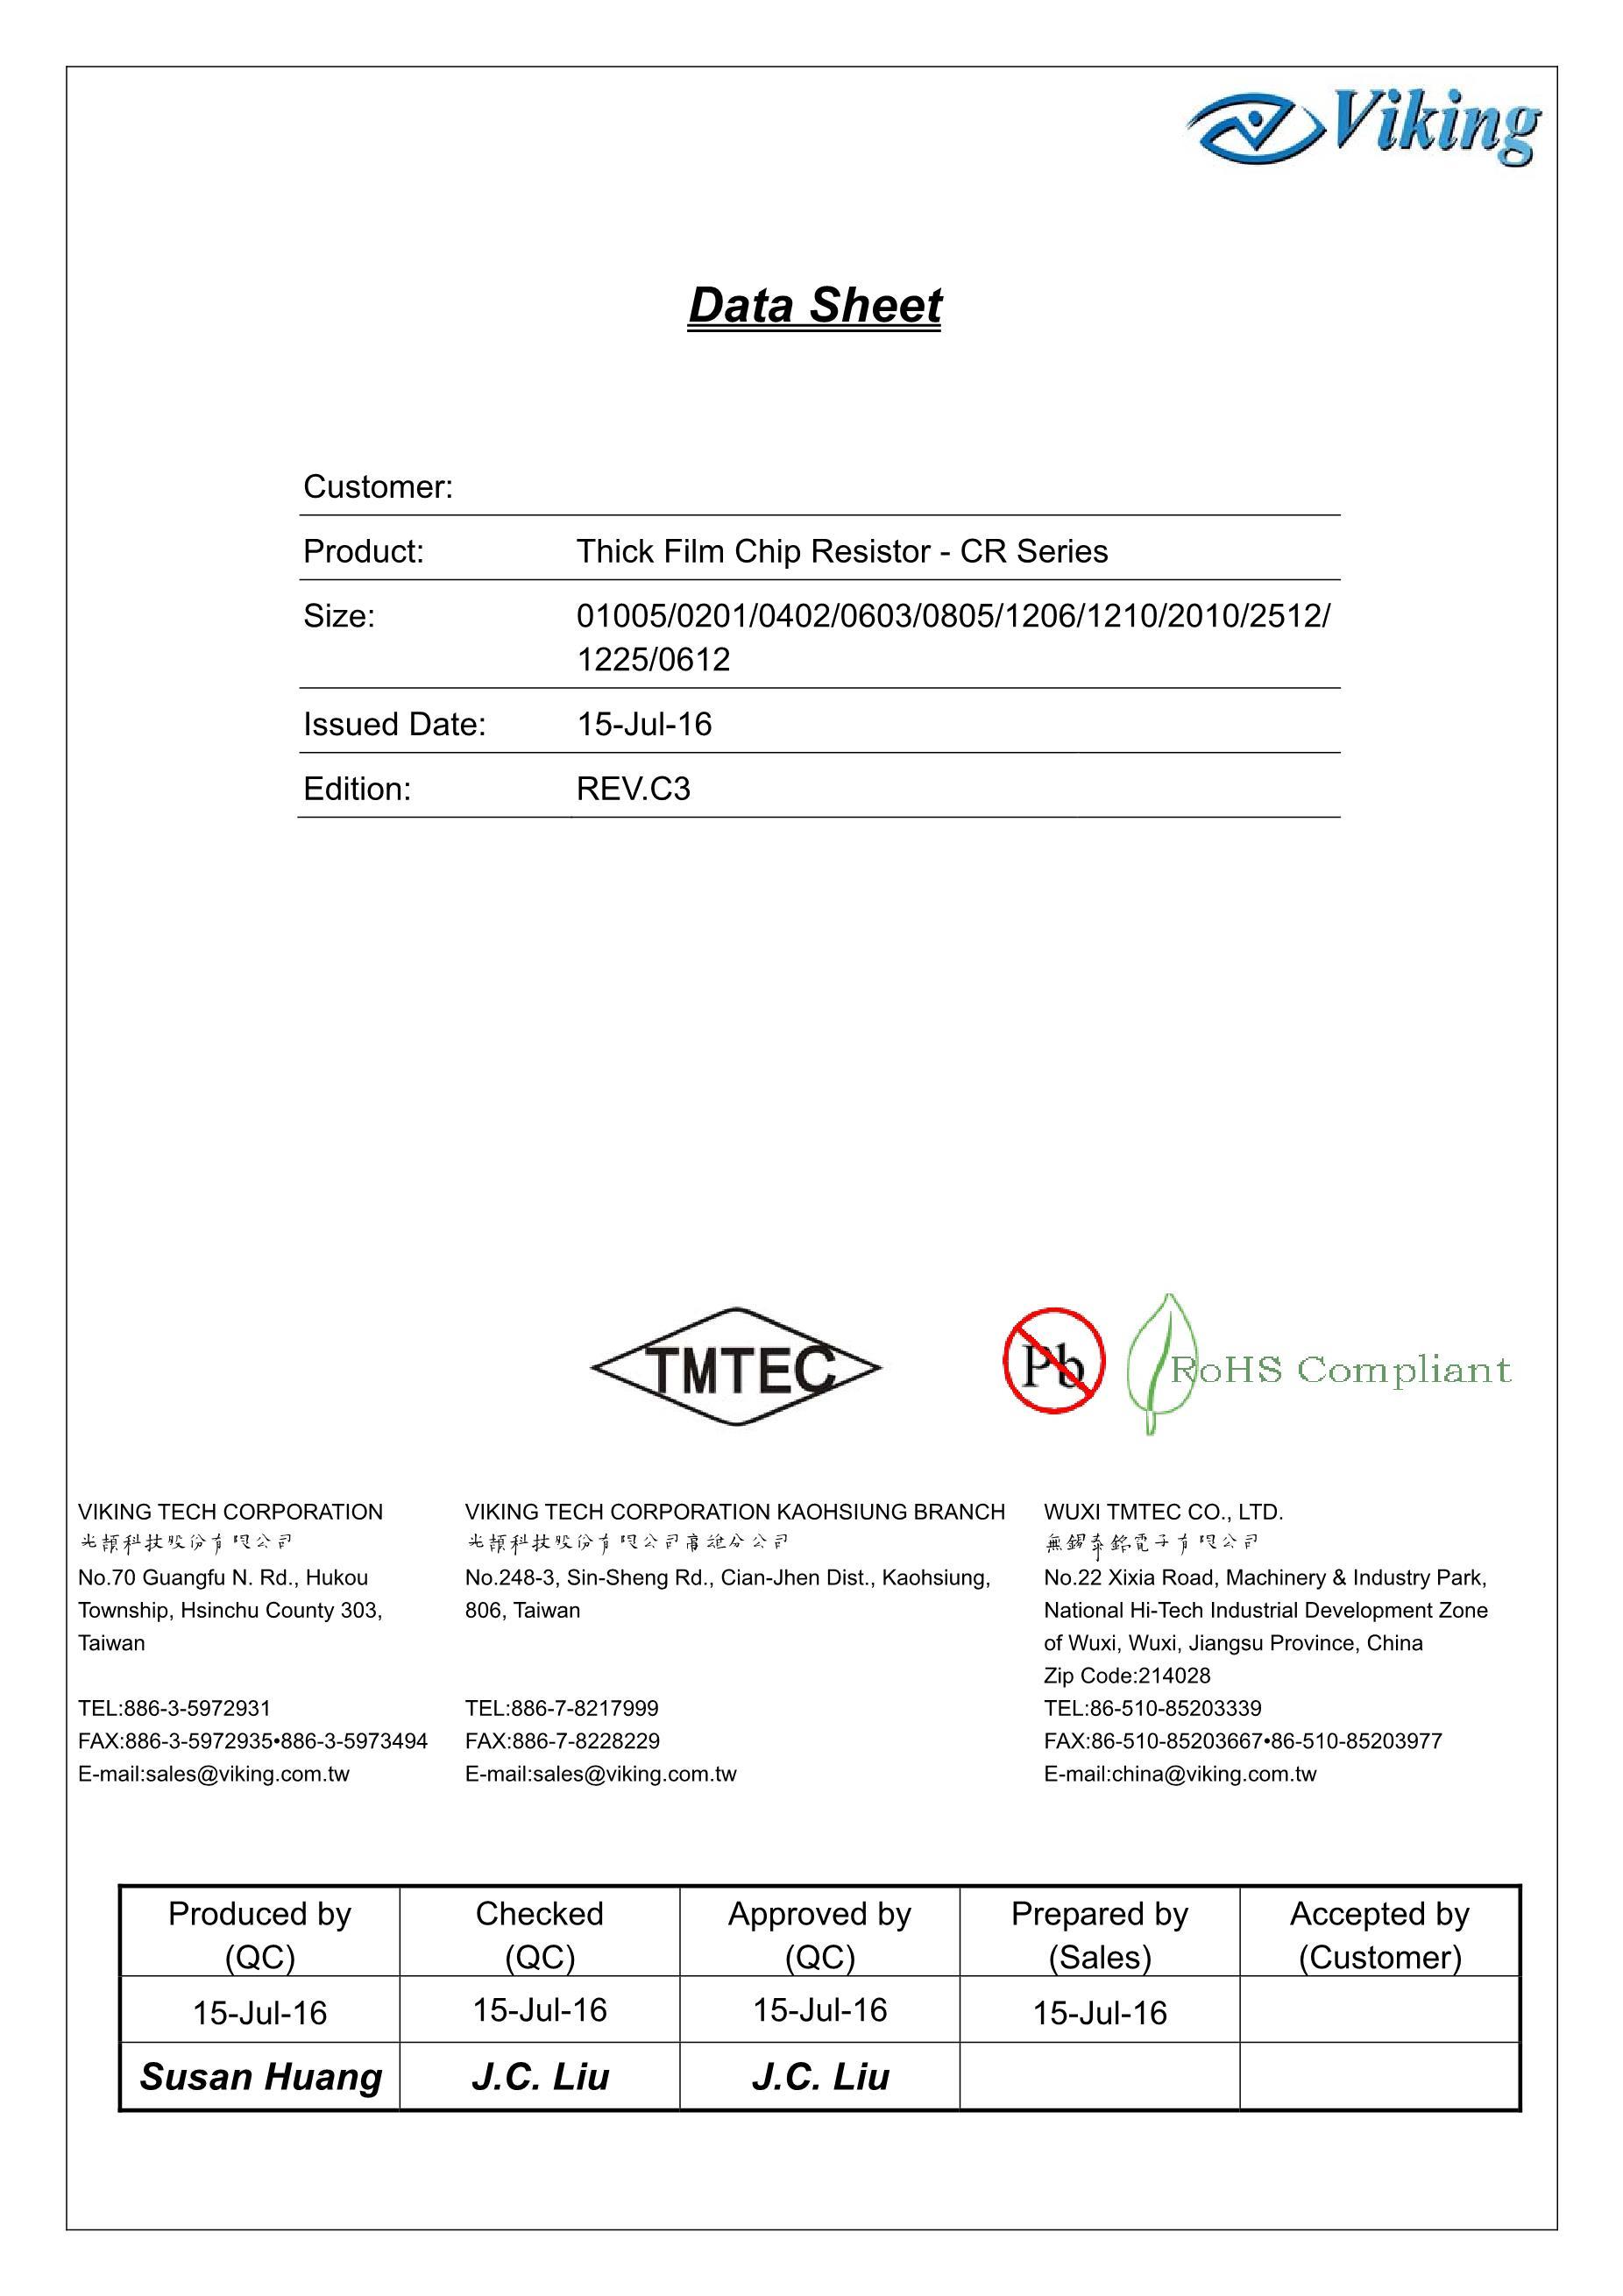 820R 820E PLUG IN HORIZONTAL CEMENT RESISTOR RX27 20W's pdf picture 1